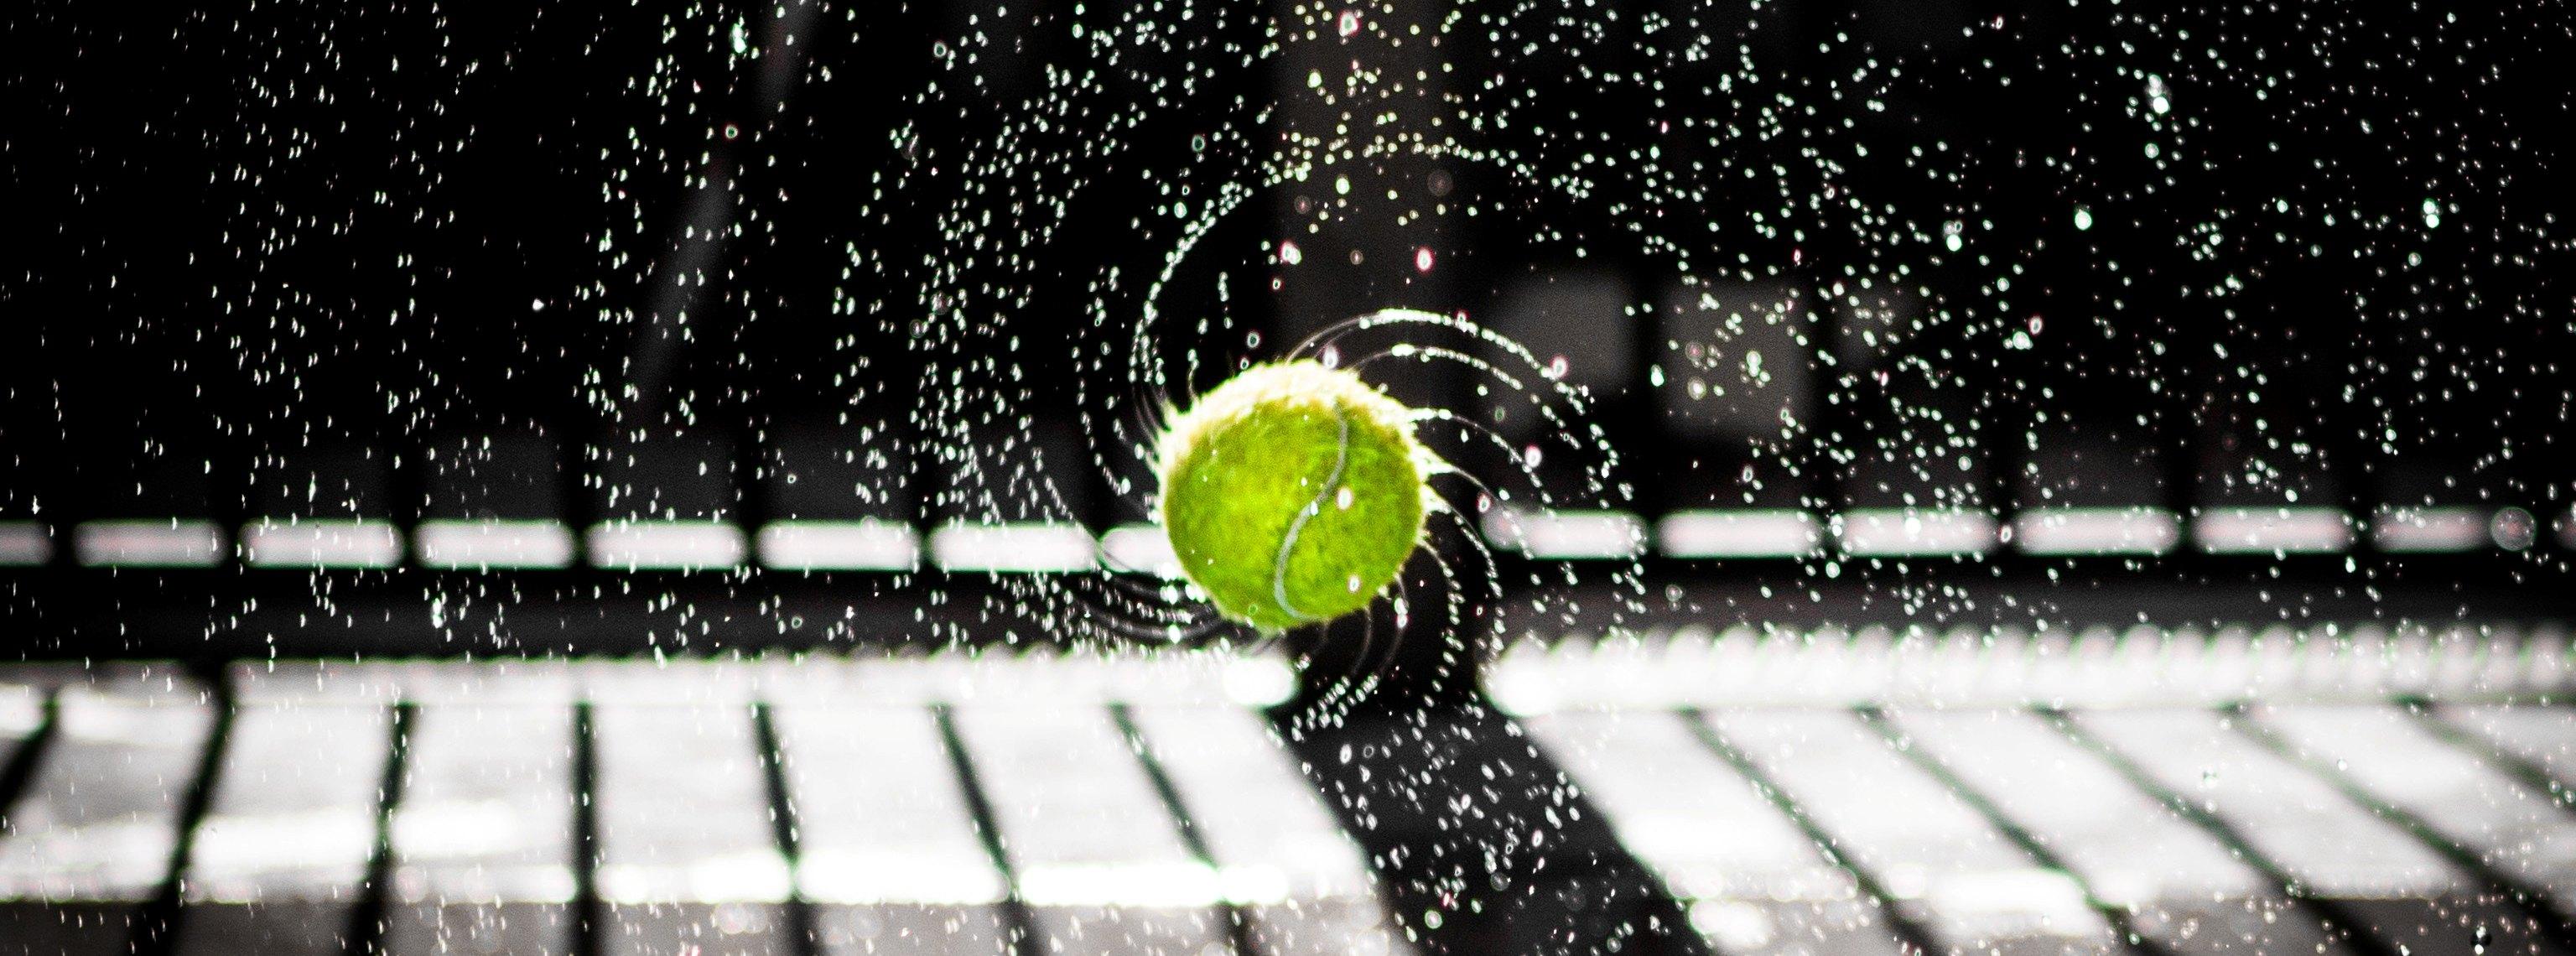 Tennis ball banner - josh-calabrese-179700-unsplash.jpg